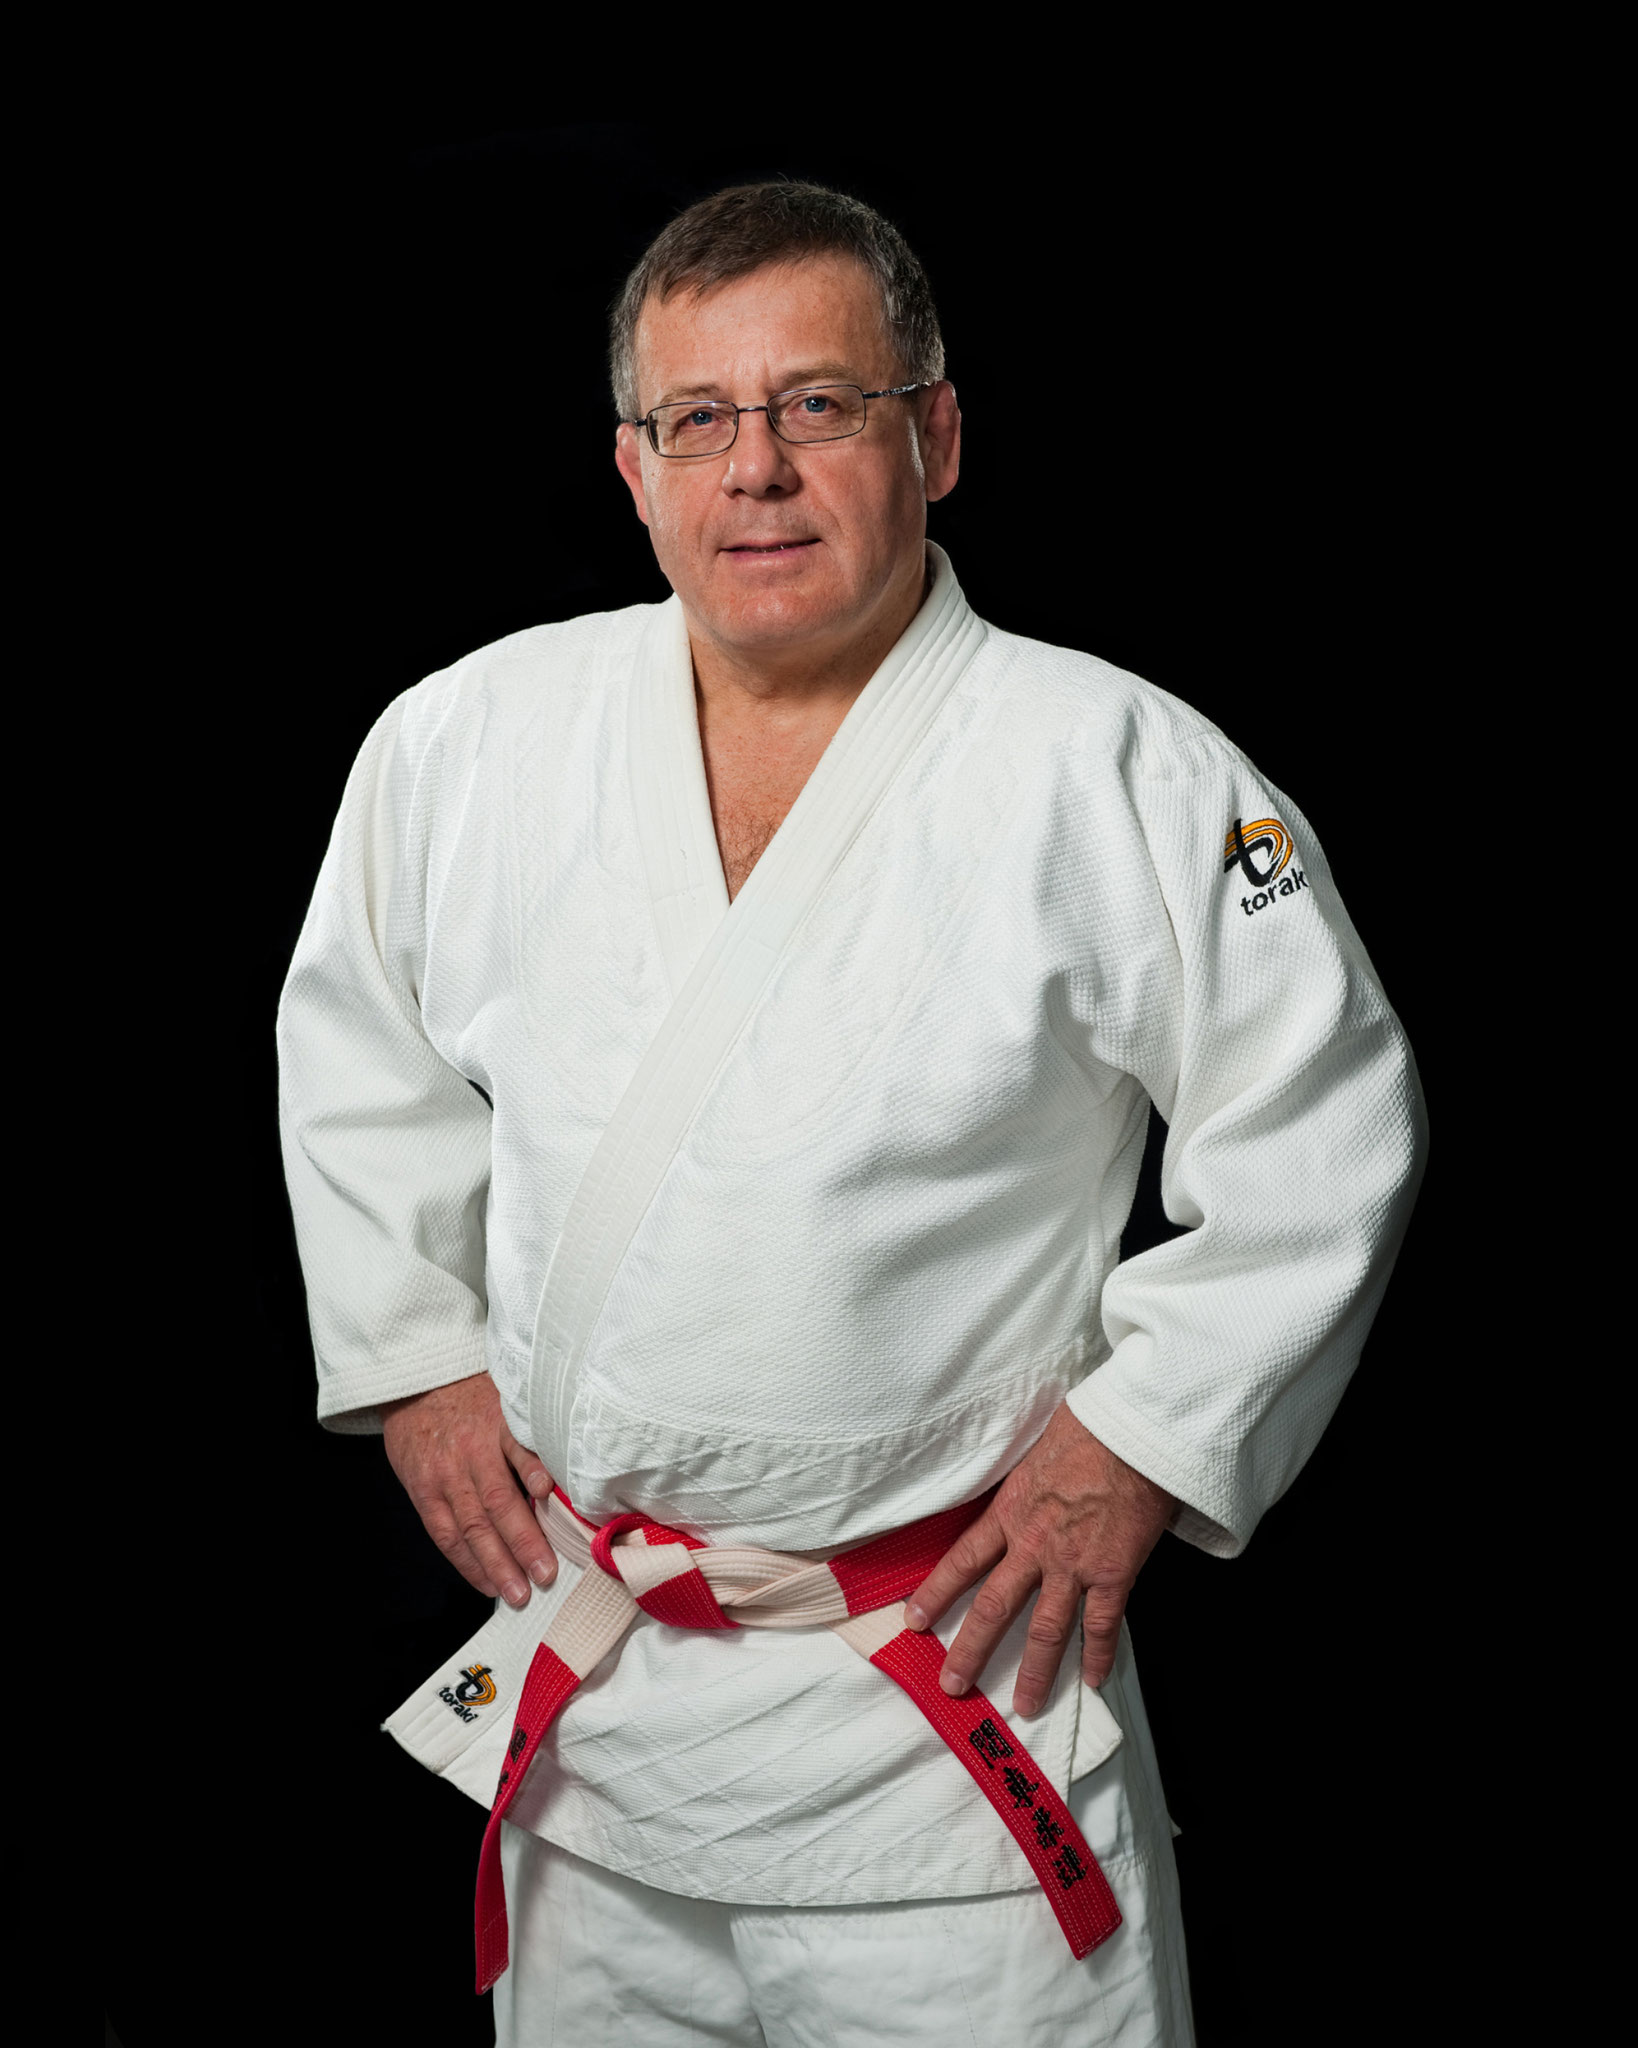 Sensei Yves Landry, Rokudan et co-fondateur du club